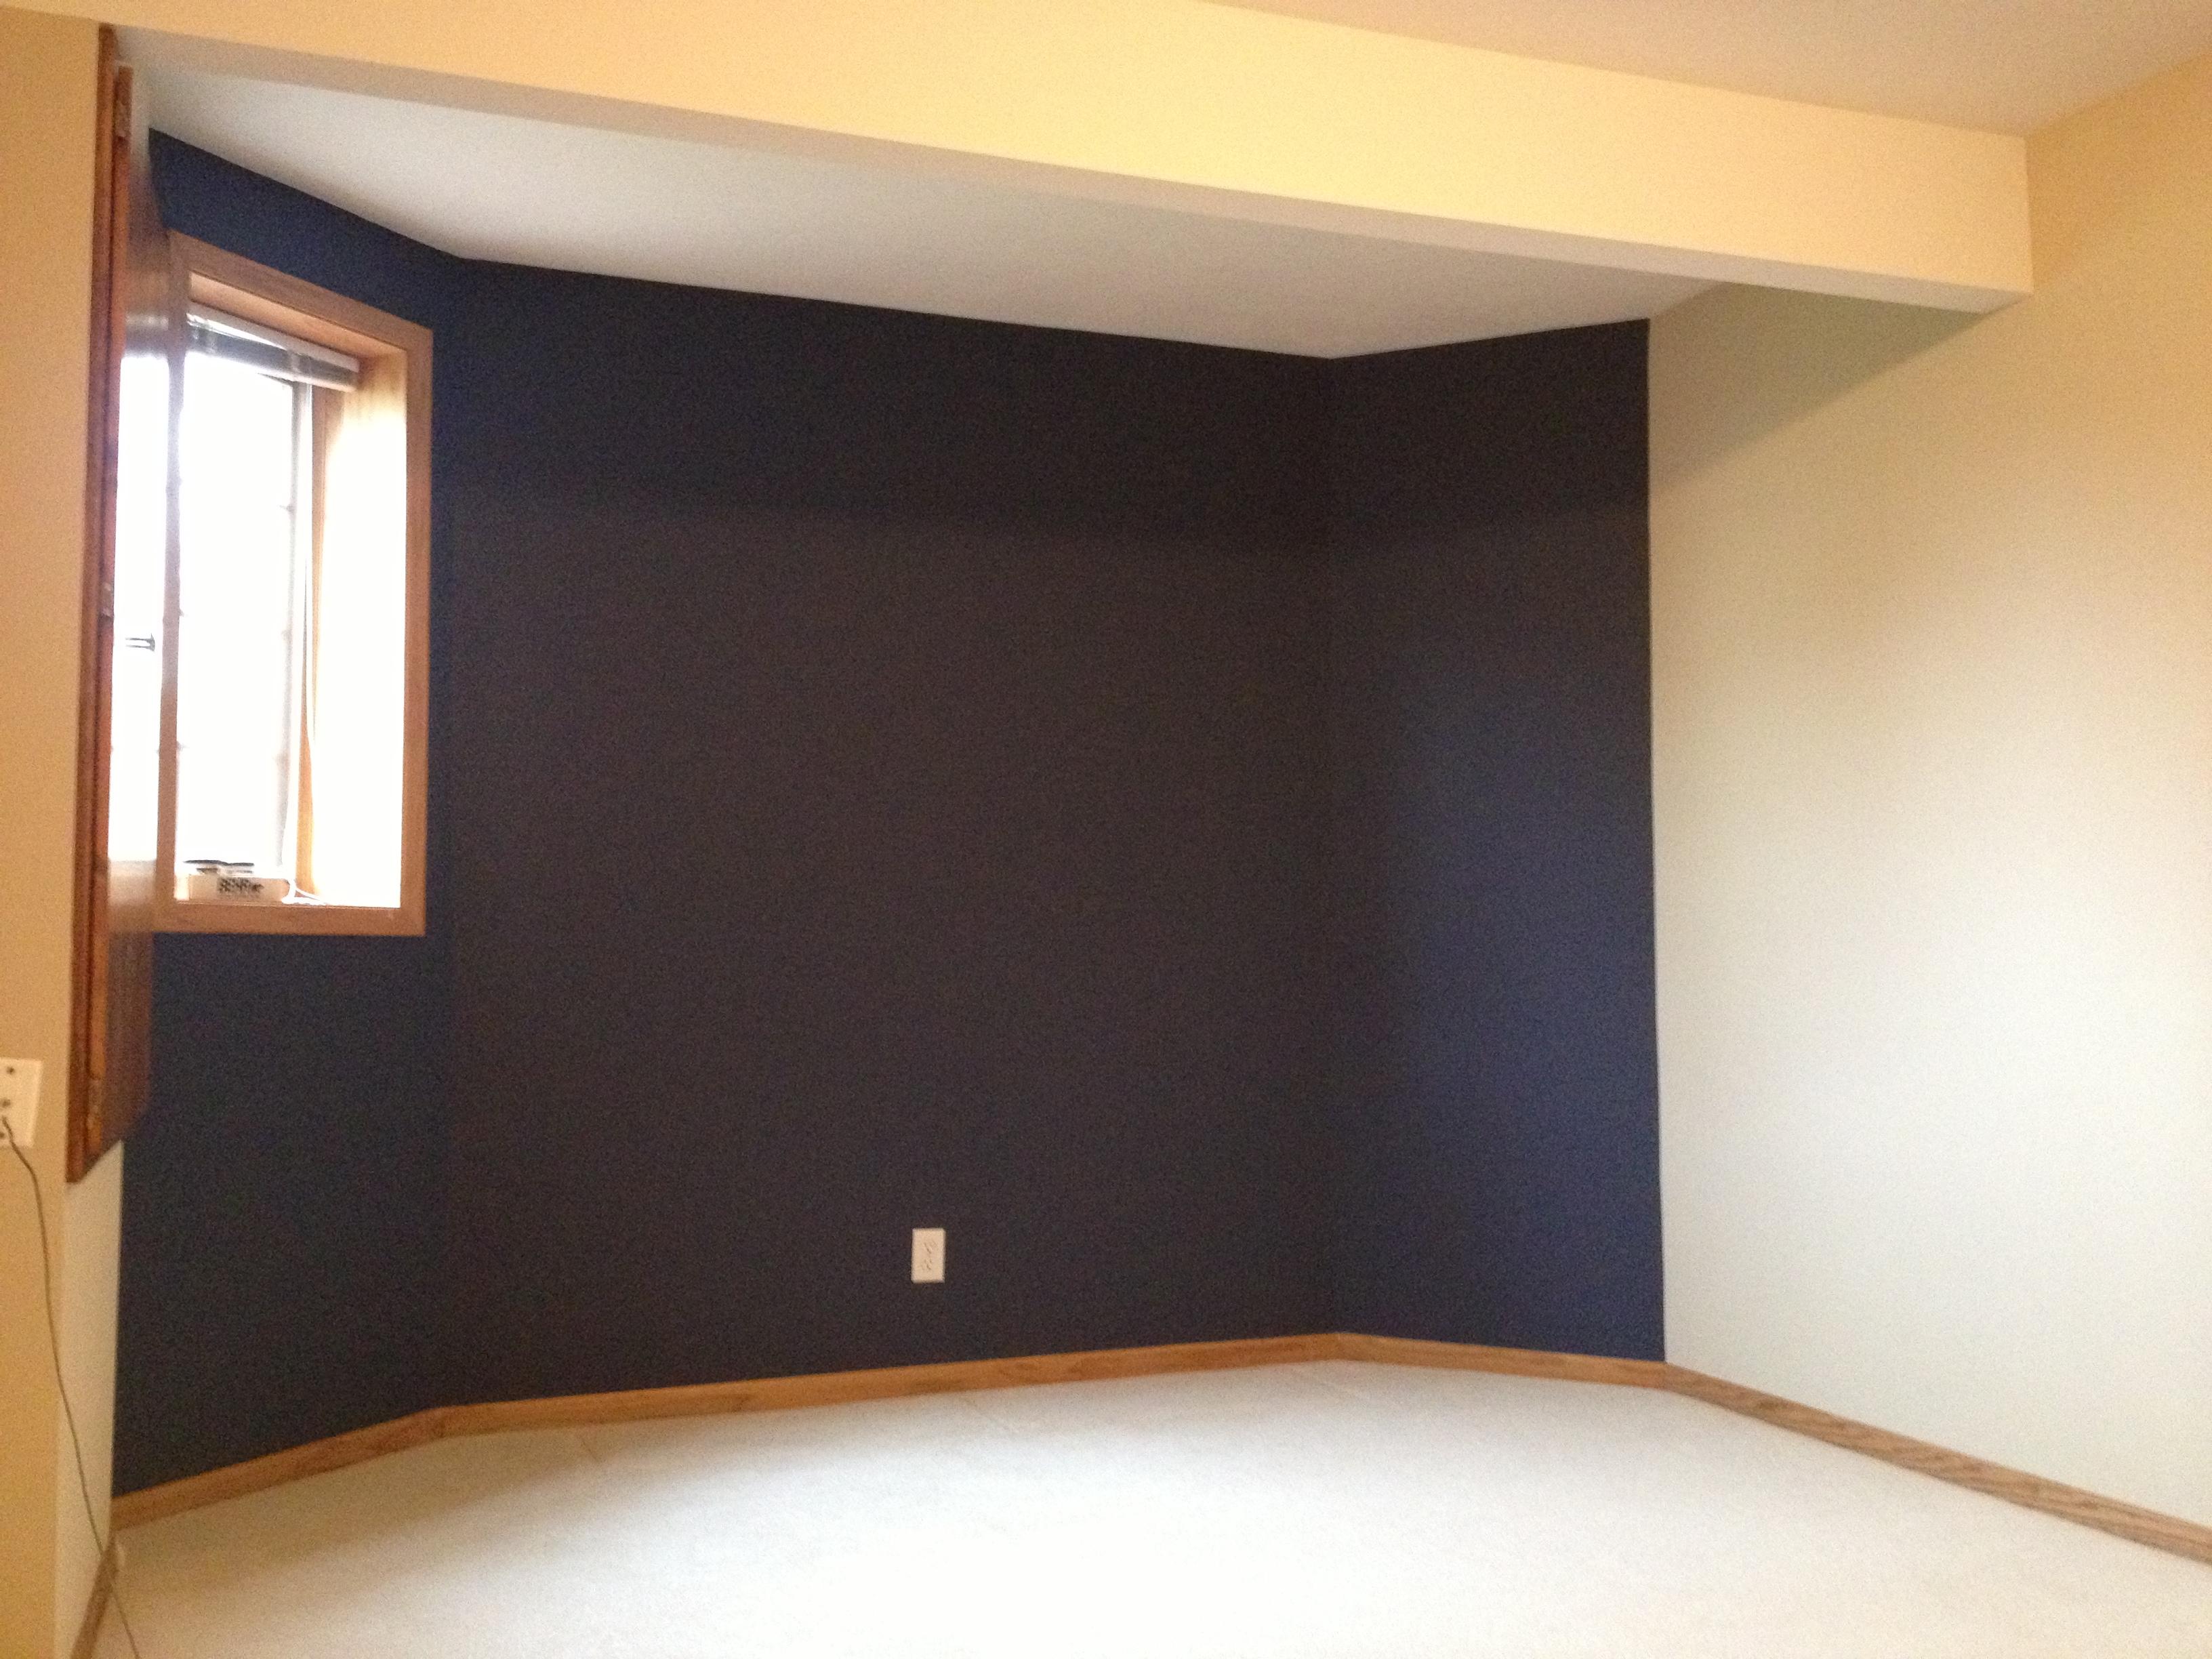 Moving Into A New Home Or Condo